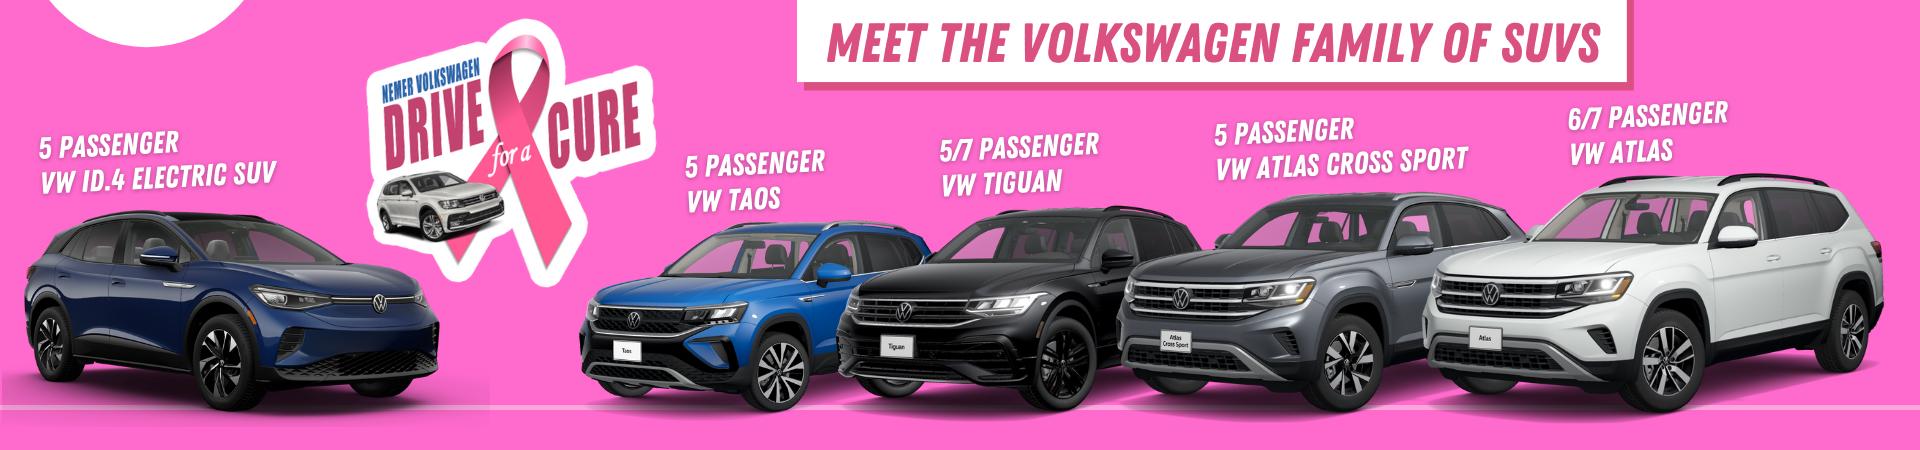 VW Family of SUVs